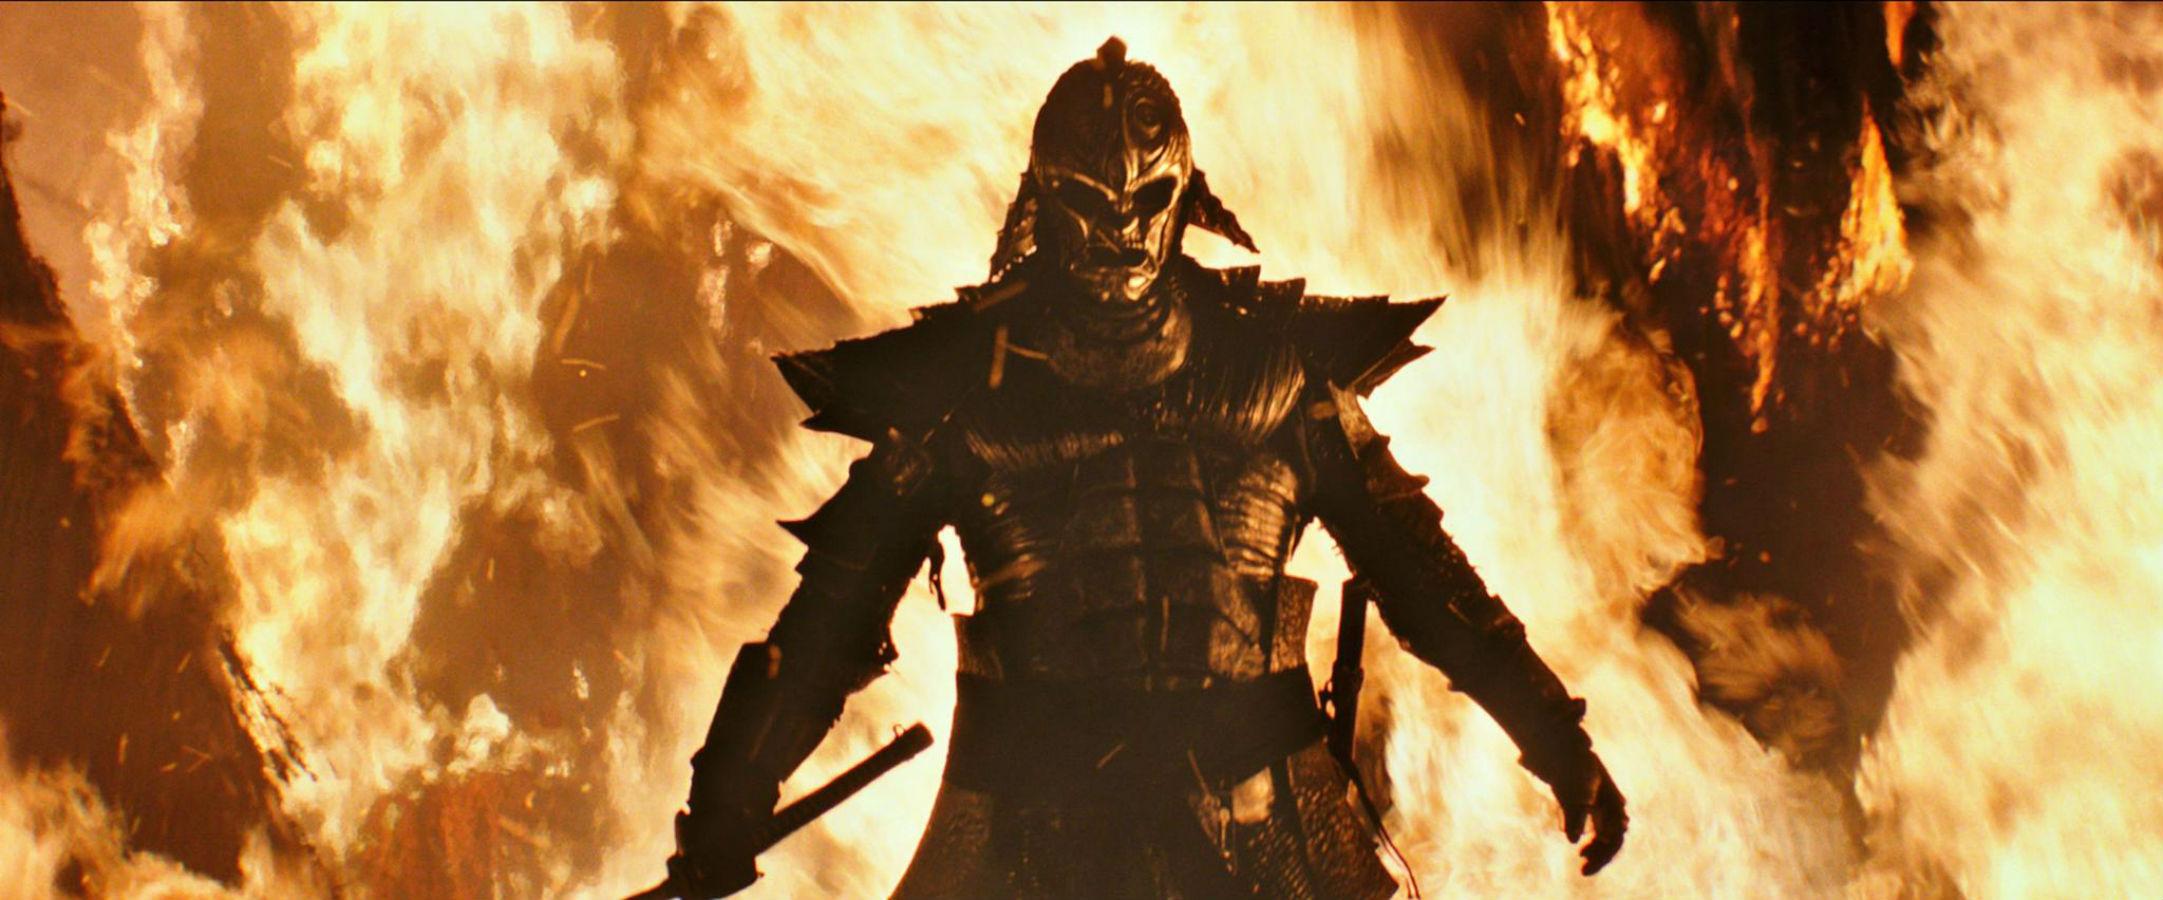 Samurai Warriors 3 Iso